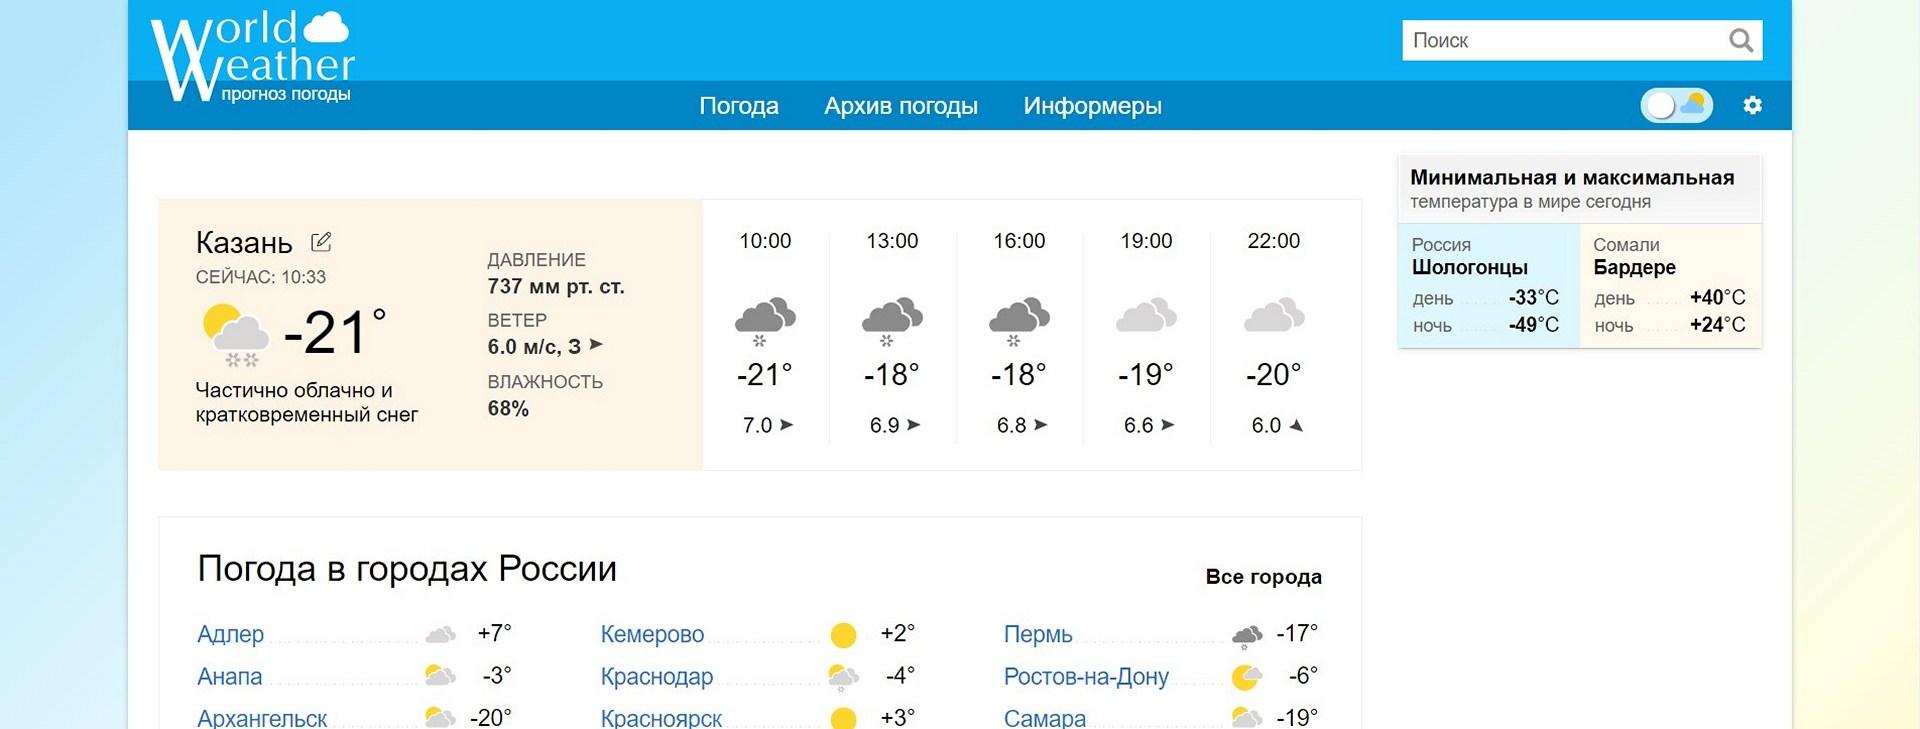 сайт прогноза погоды word-weather.ru